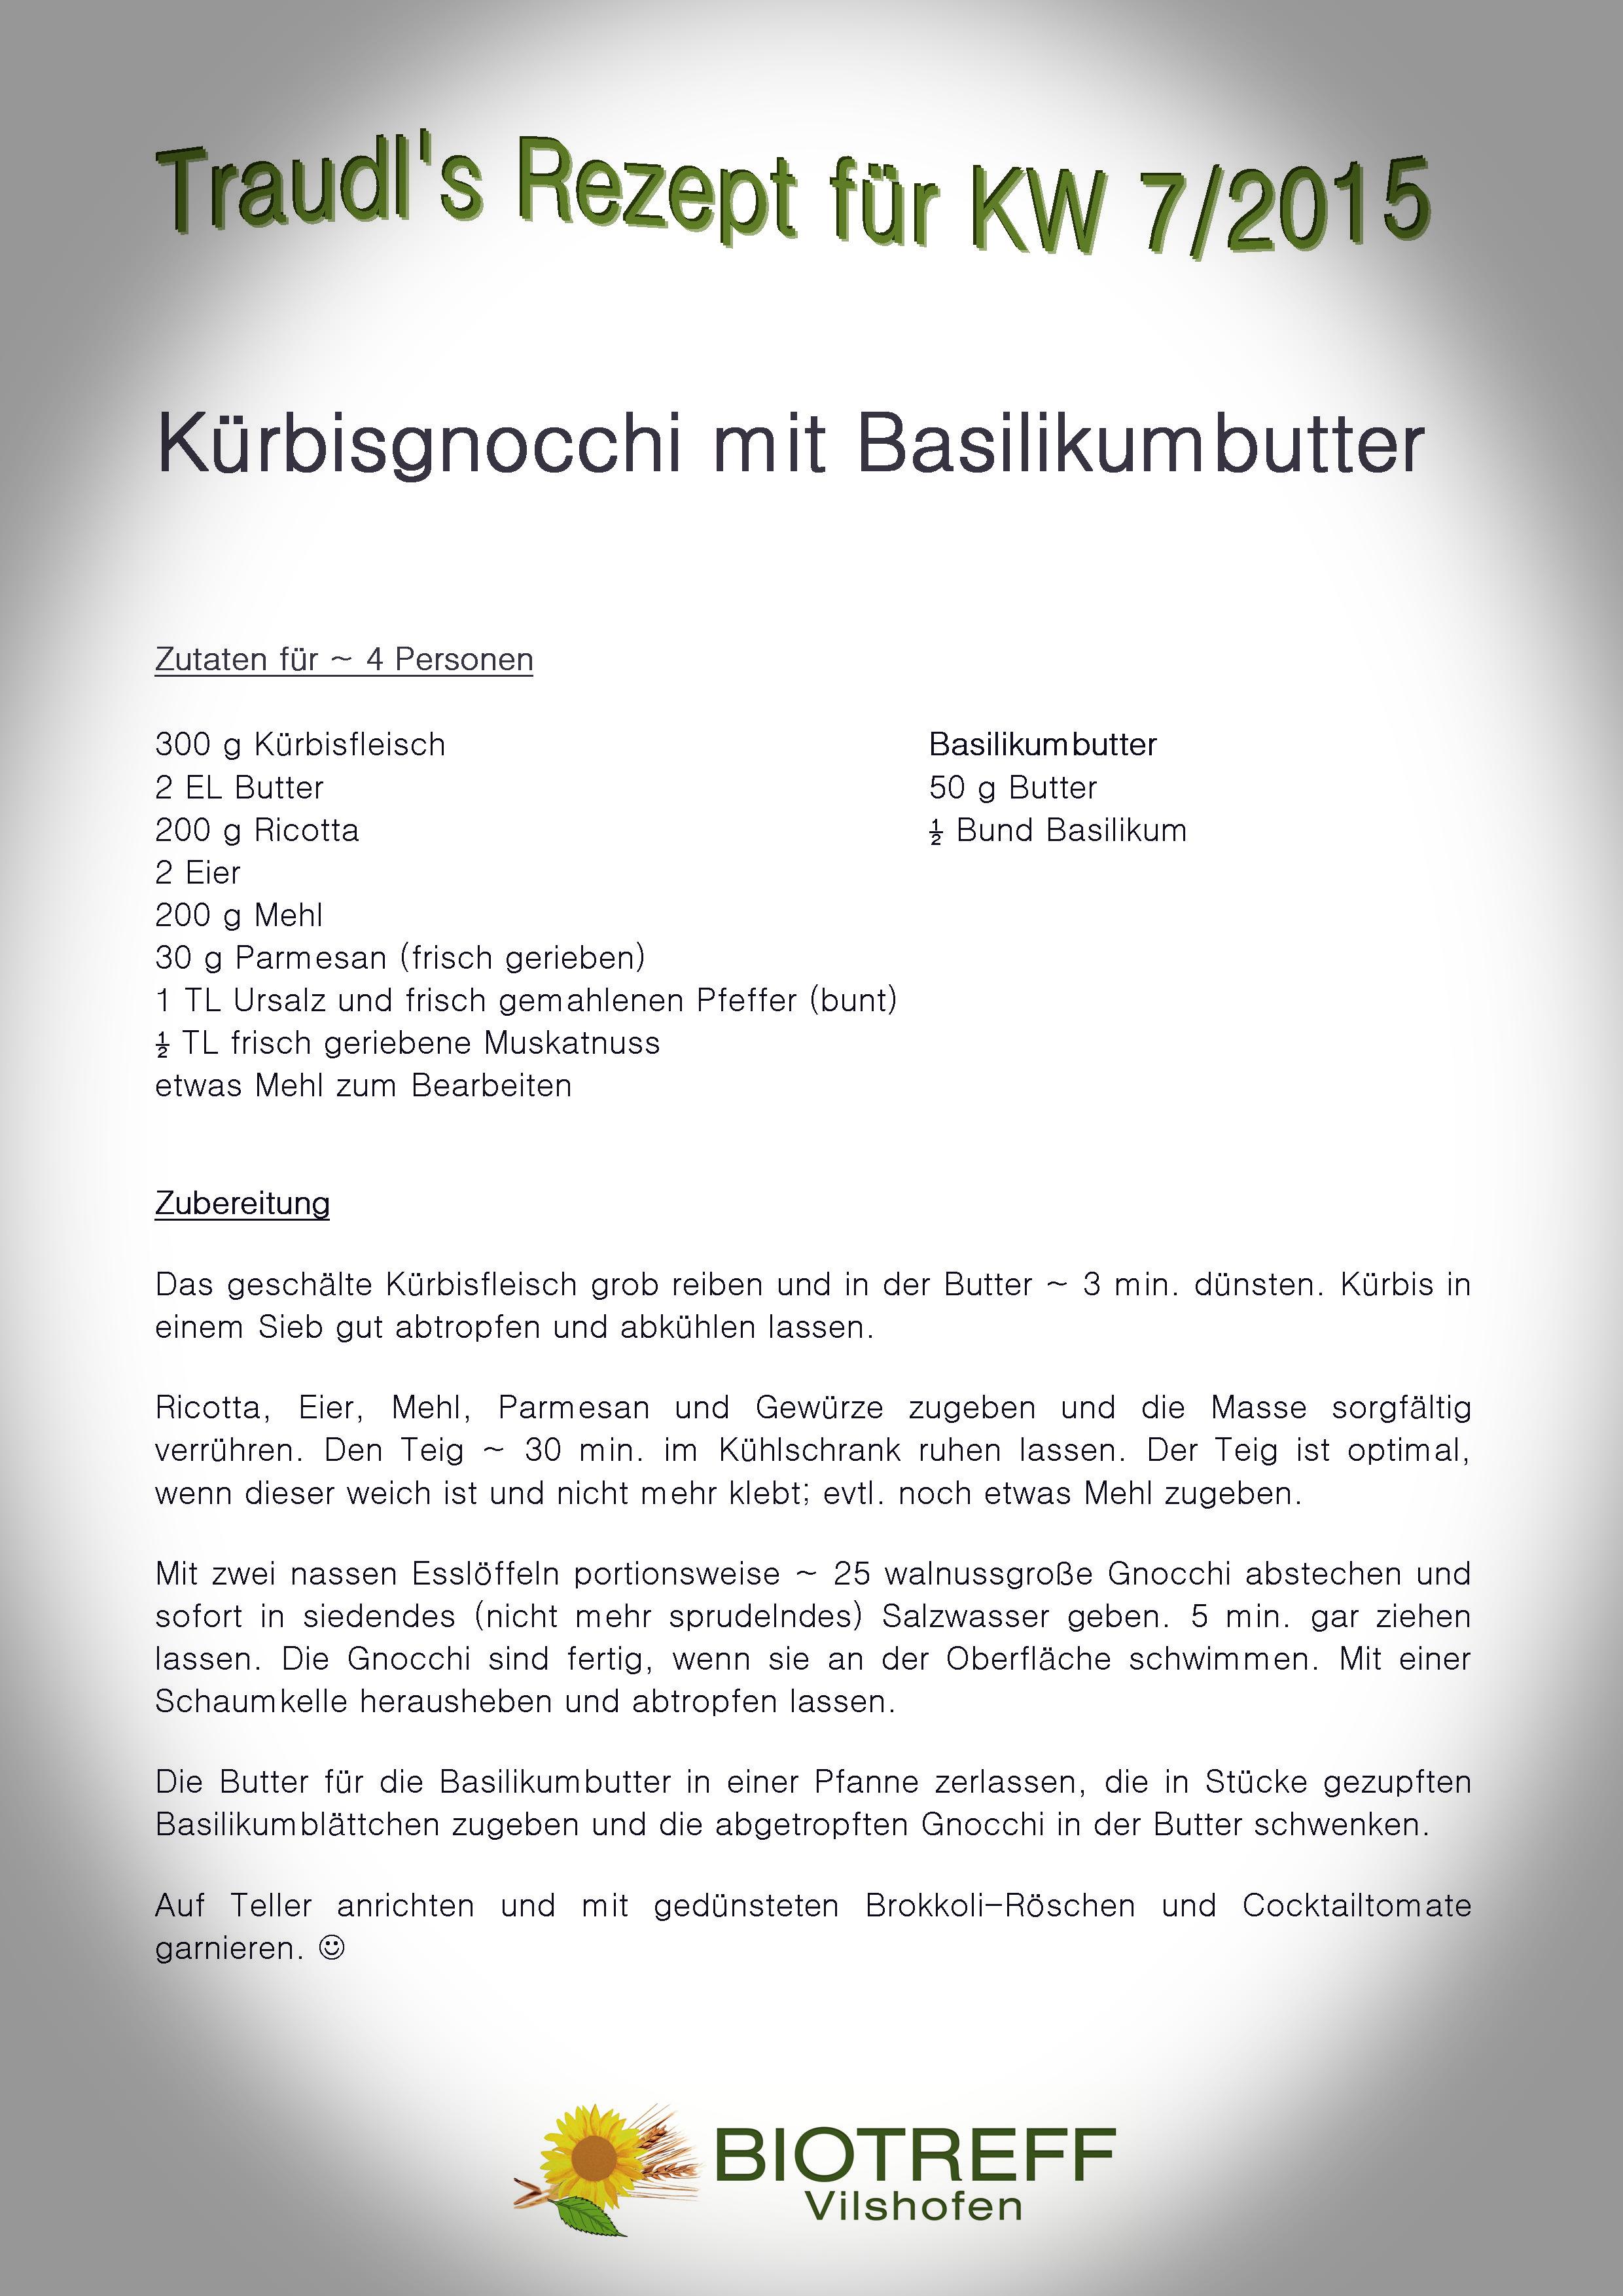 KW 7 Kürbisgnocchi mit Basilikumbutter